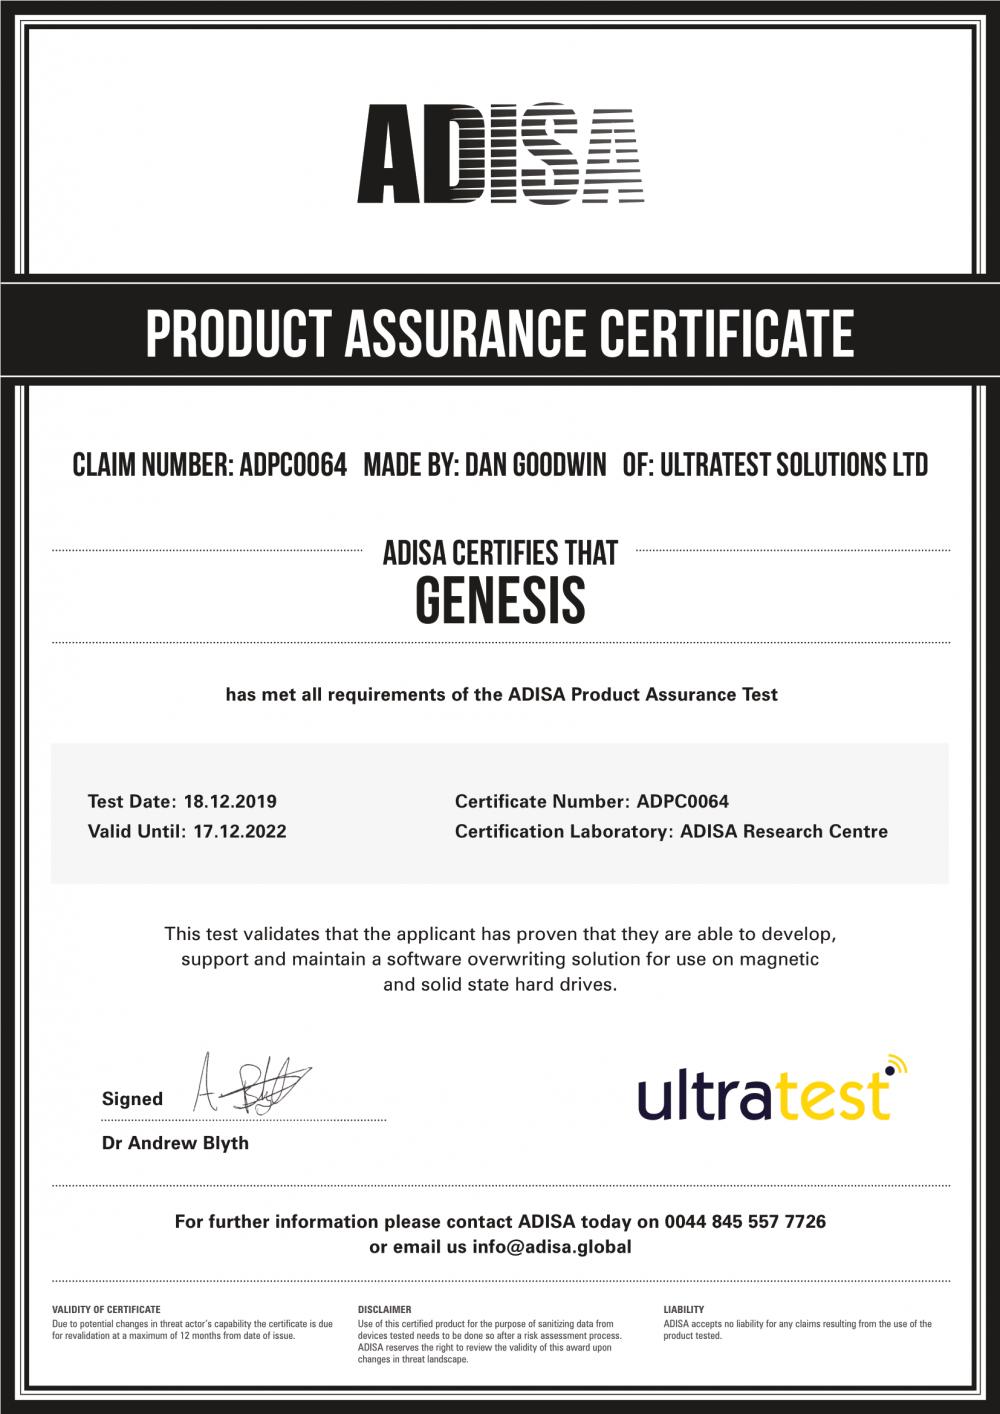 ADISA Product Assurance